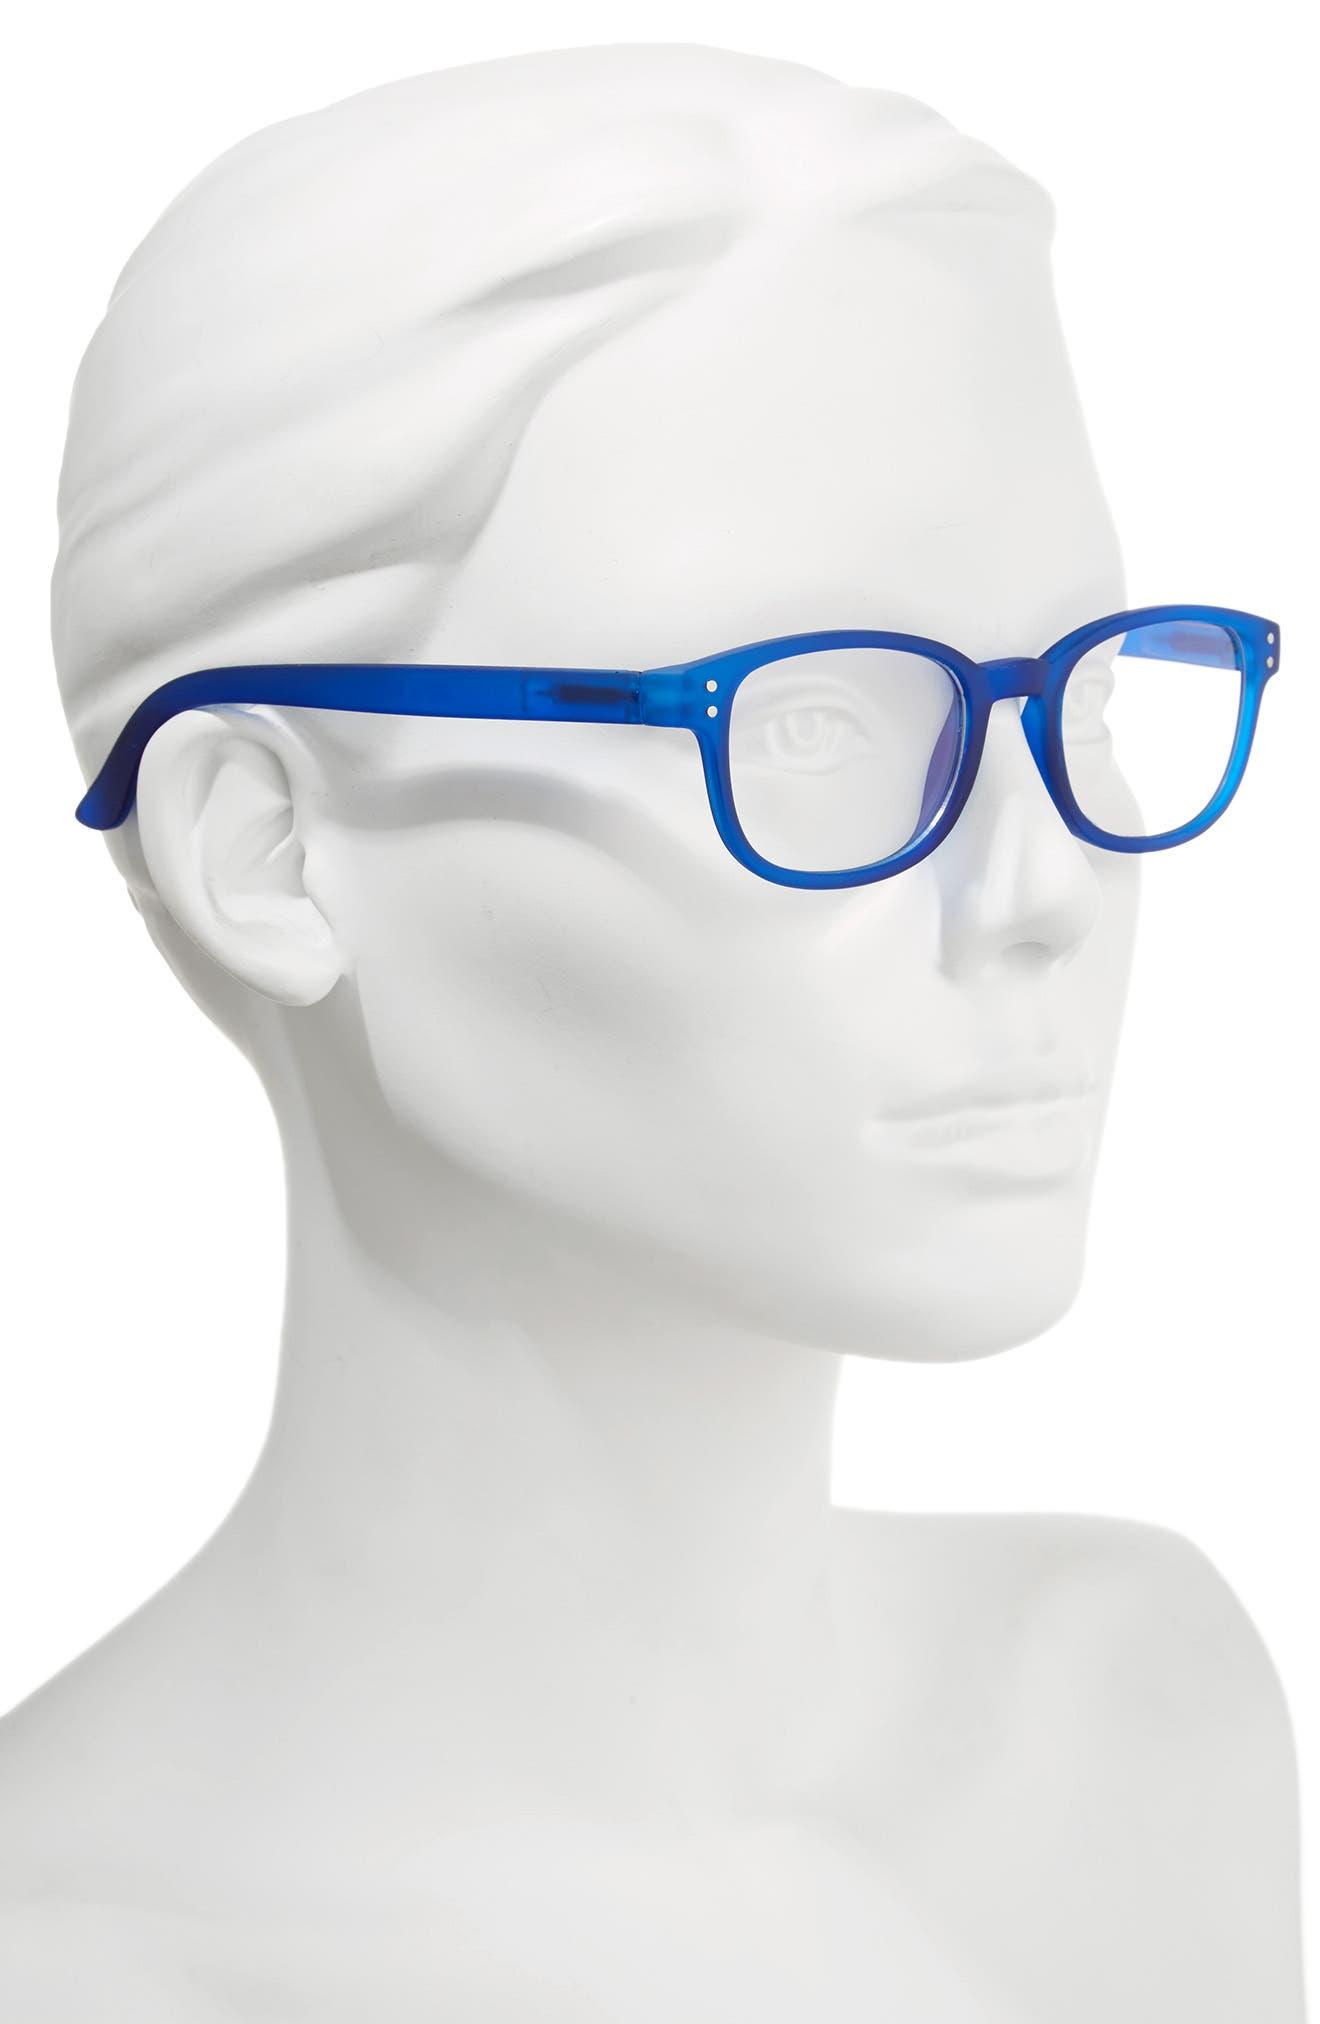 ColorSpex<sup>®</sup> 50mm Blue Light Blocking Reading Glasses,                             Alternate thumbnail 2, color,                             BLUE